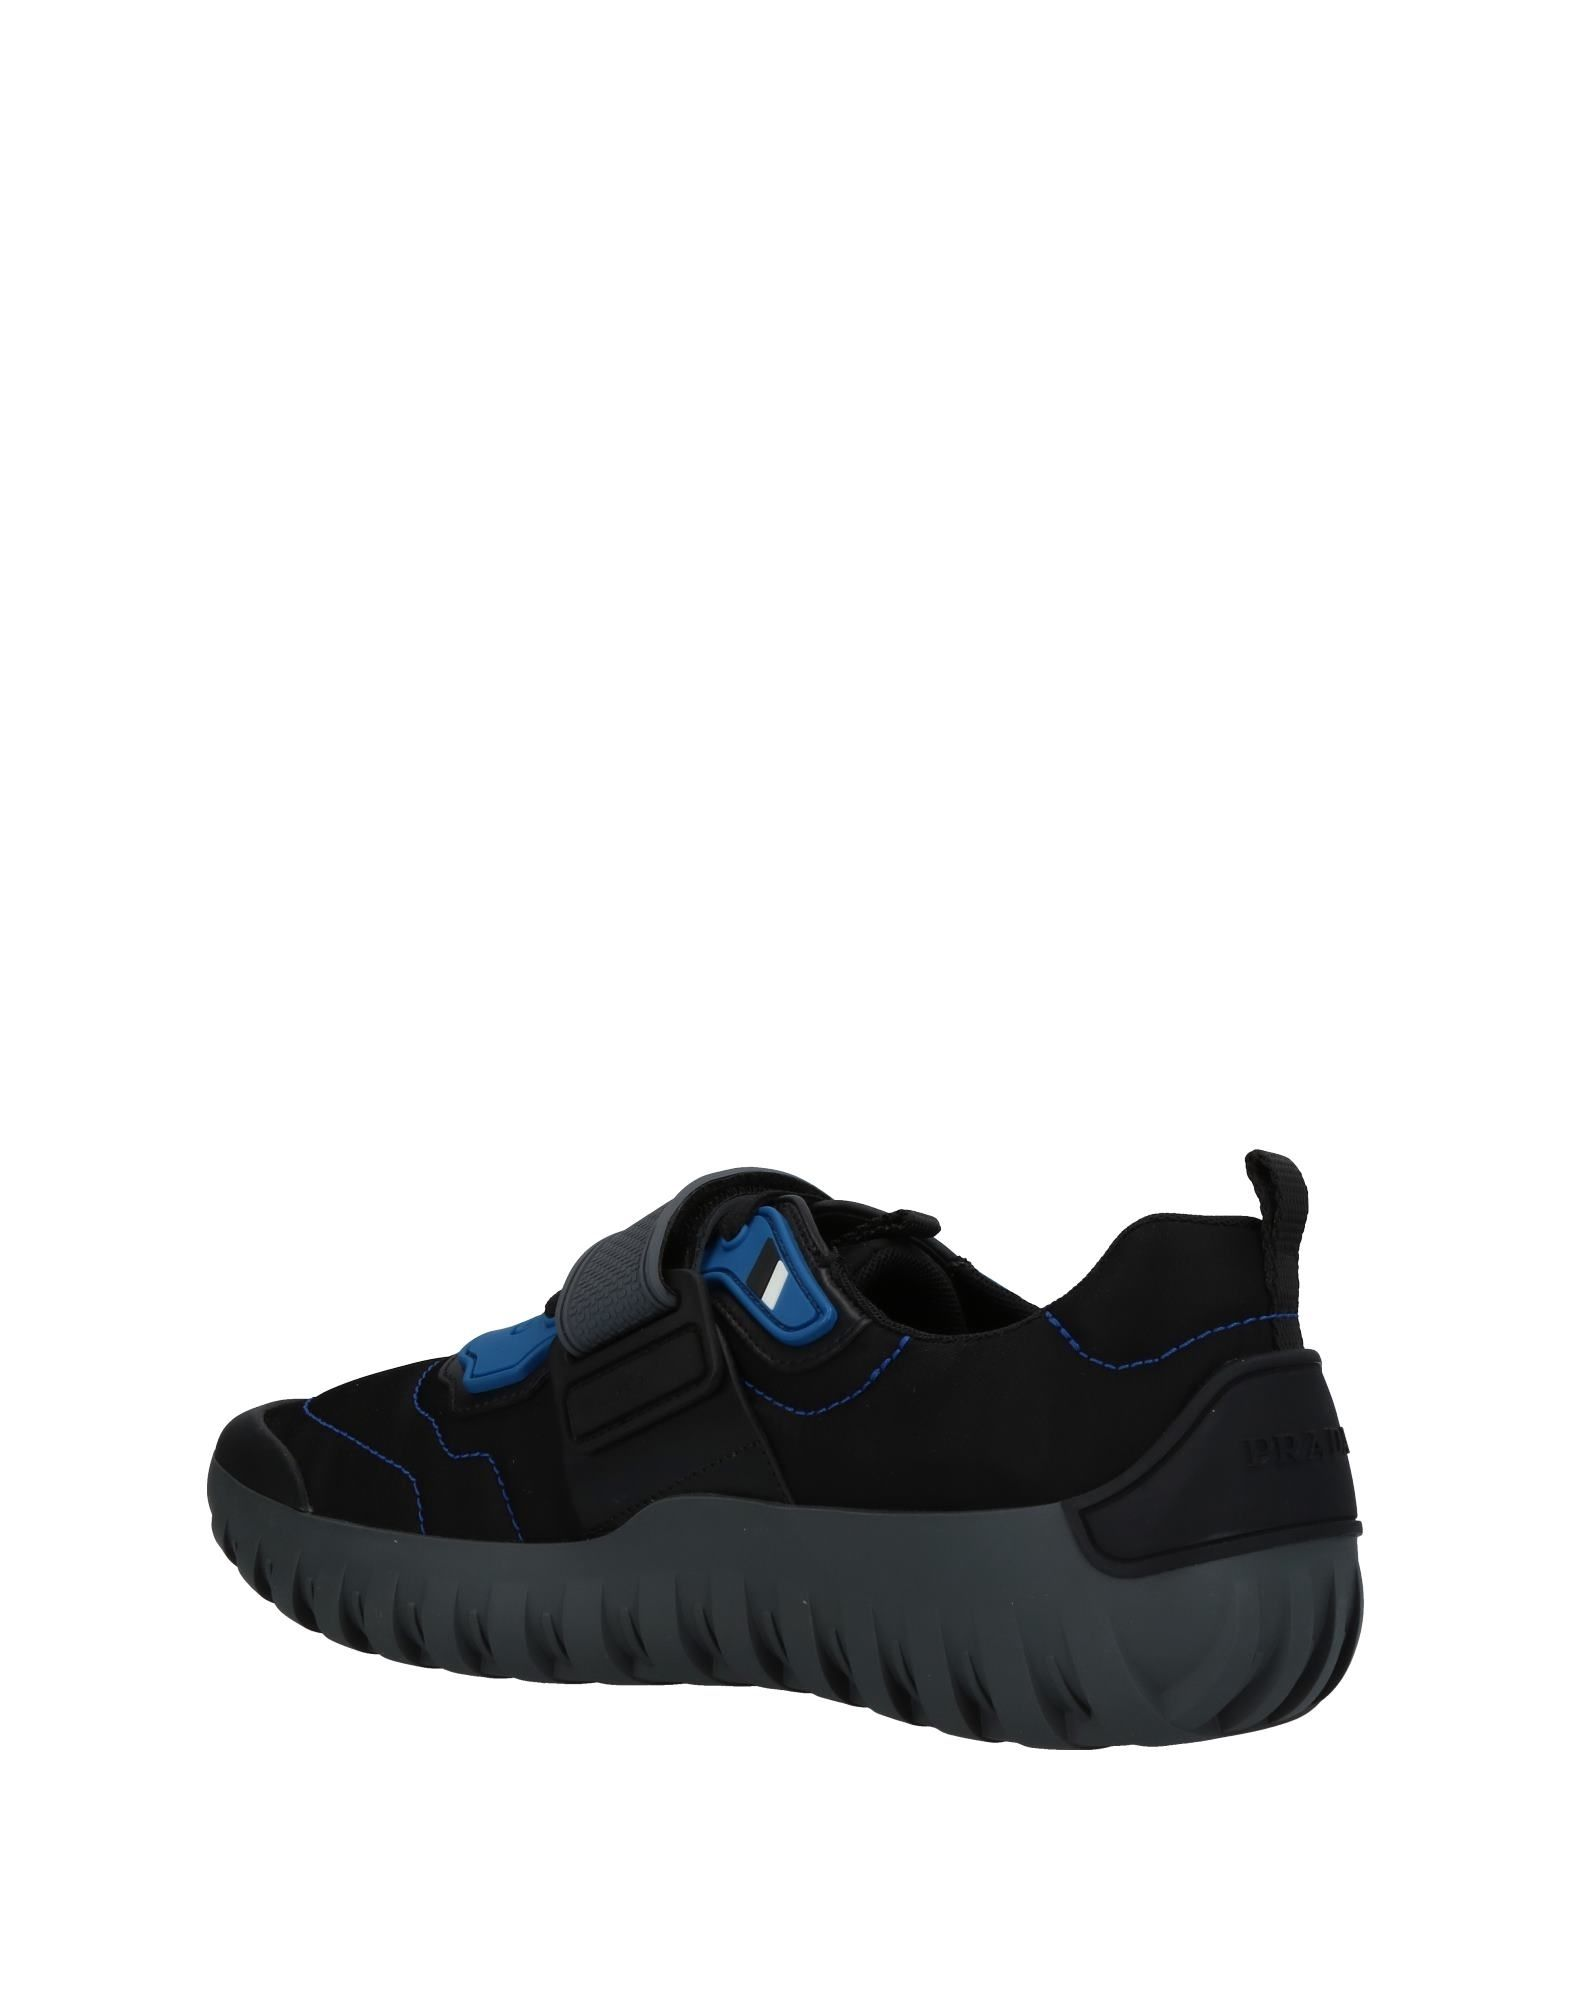 Prada Sport Sneakers Herren  Schuhe 11369031NE Gute Qualität beliebte Schuhe  35bb1b